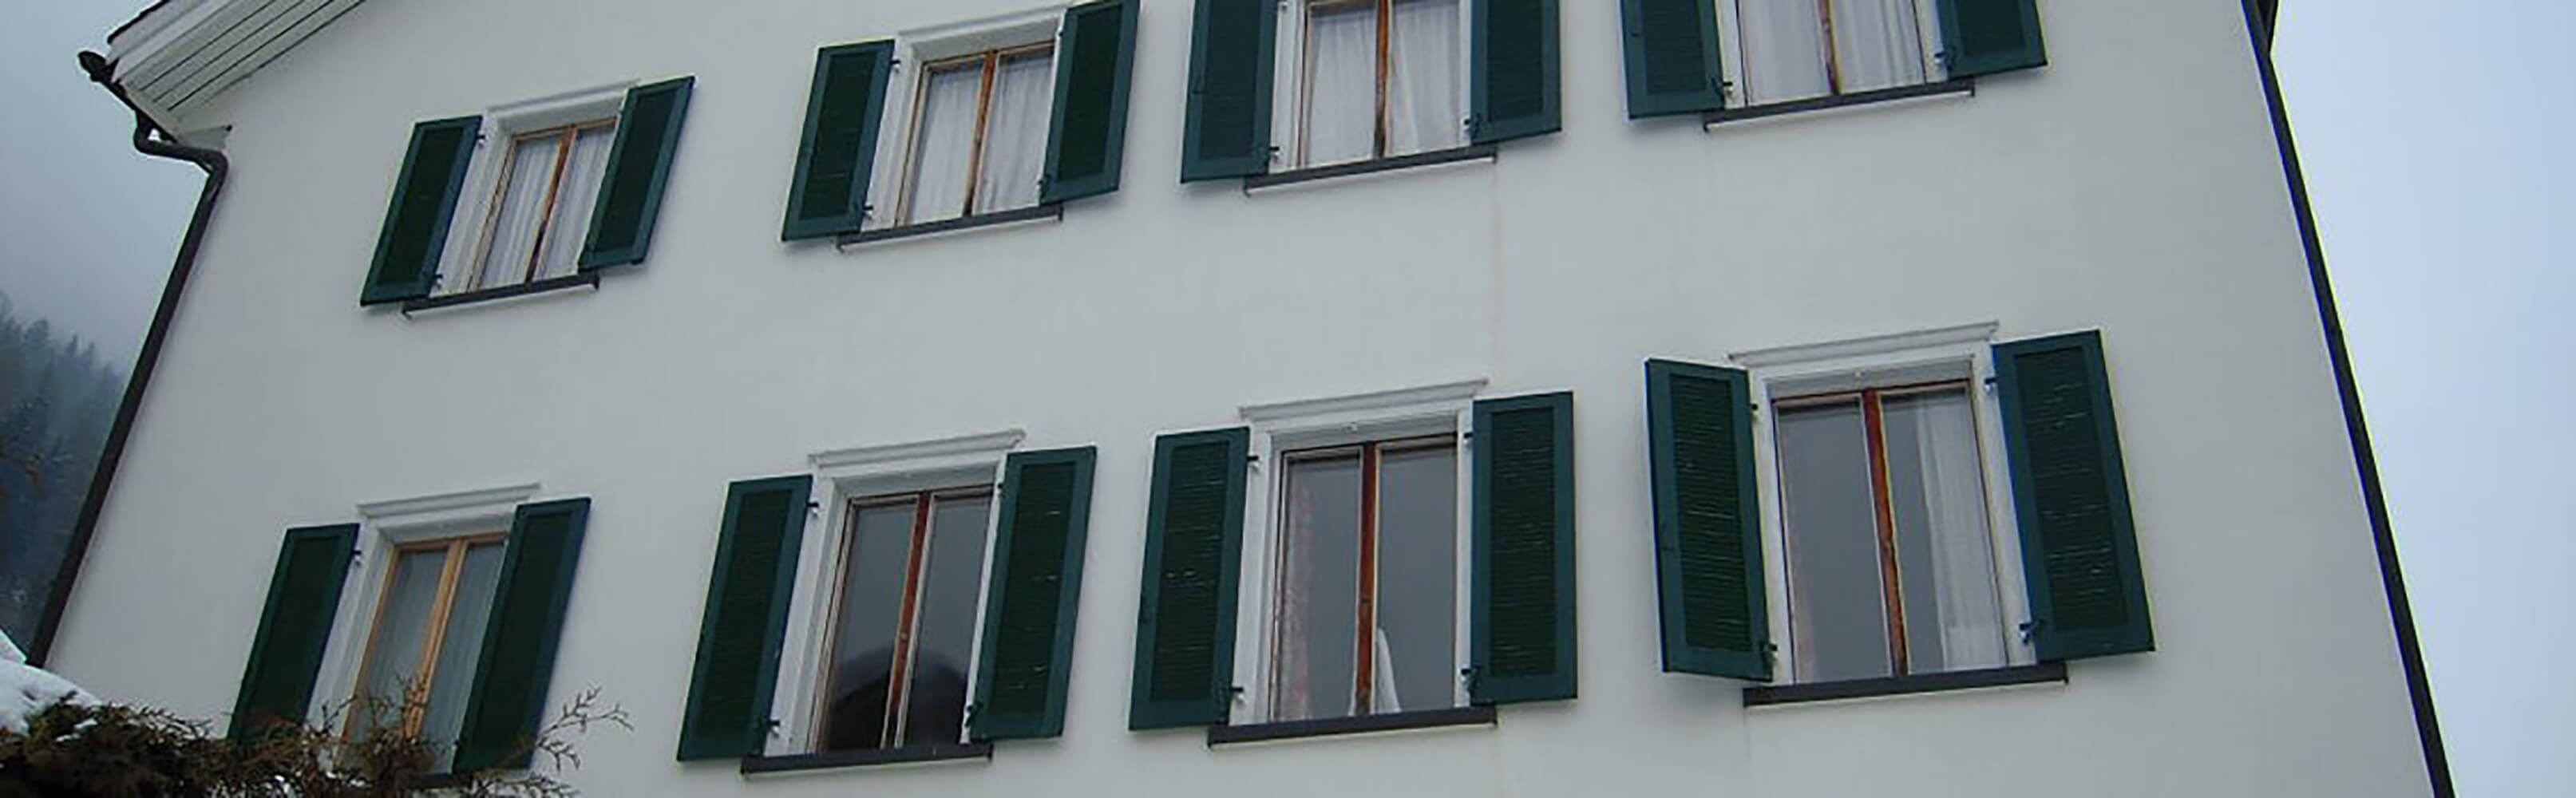 Lagerhaus / Gruppenhaus Ringel Trin 1